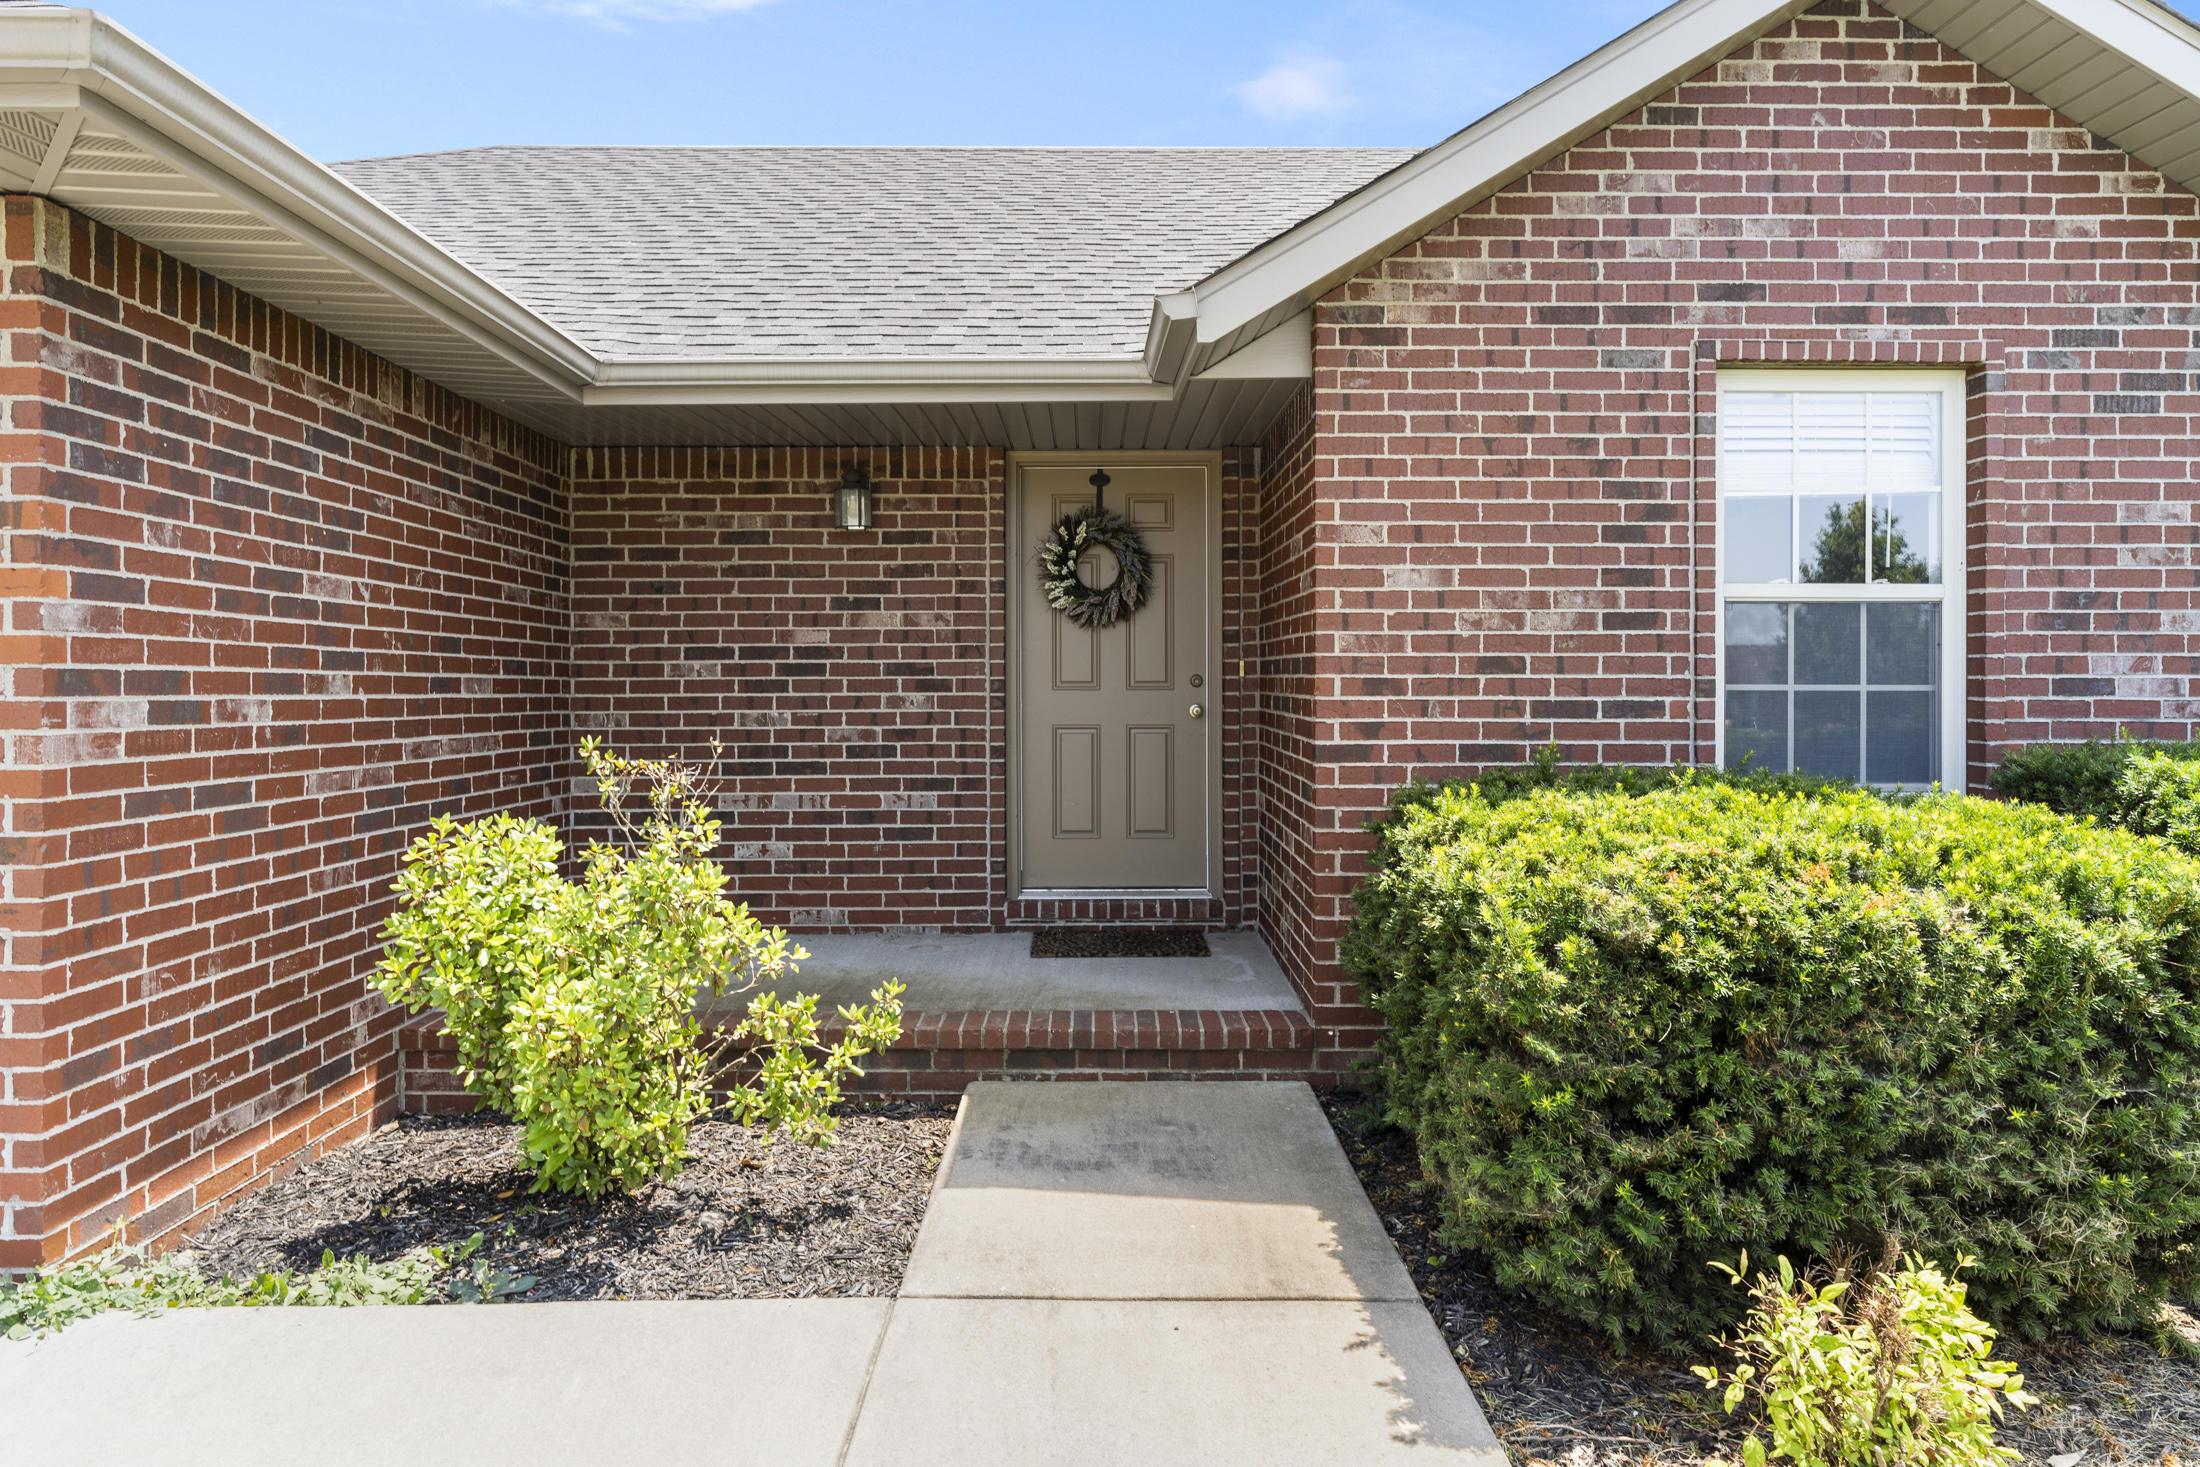 Property for sale at 1216 East Chesapeake, Ozark,  Missouri 65721